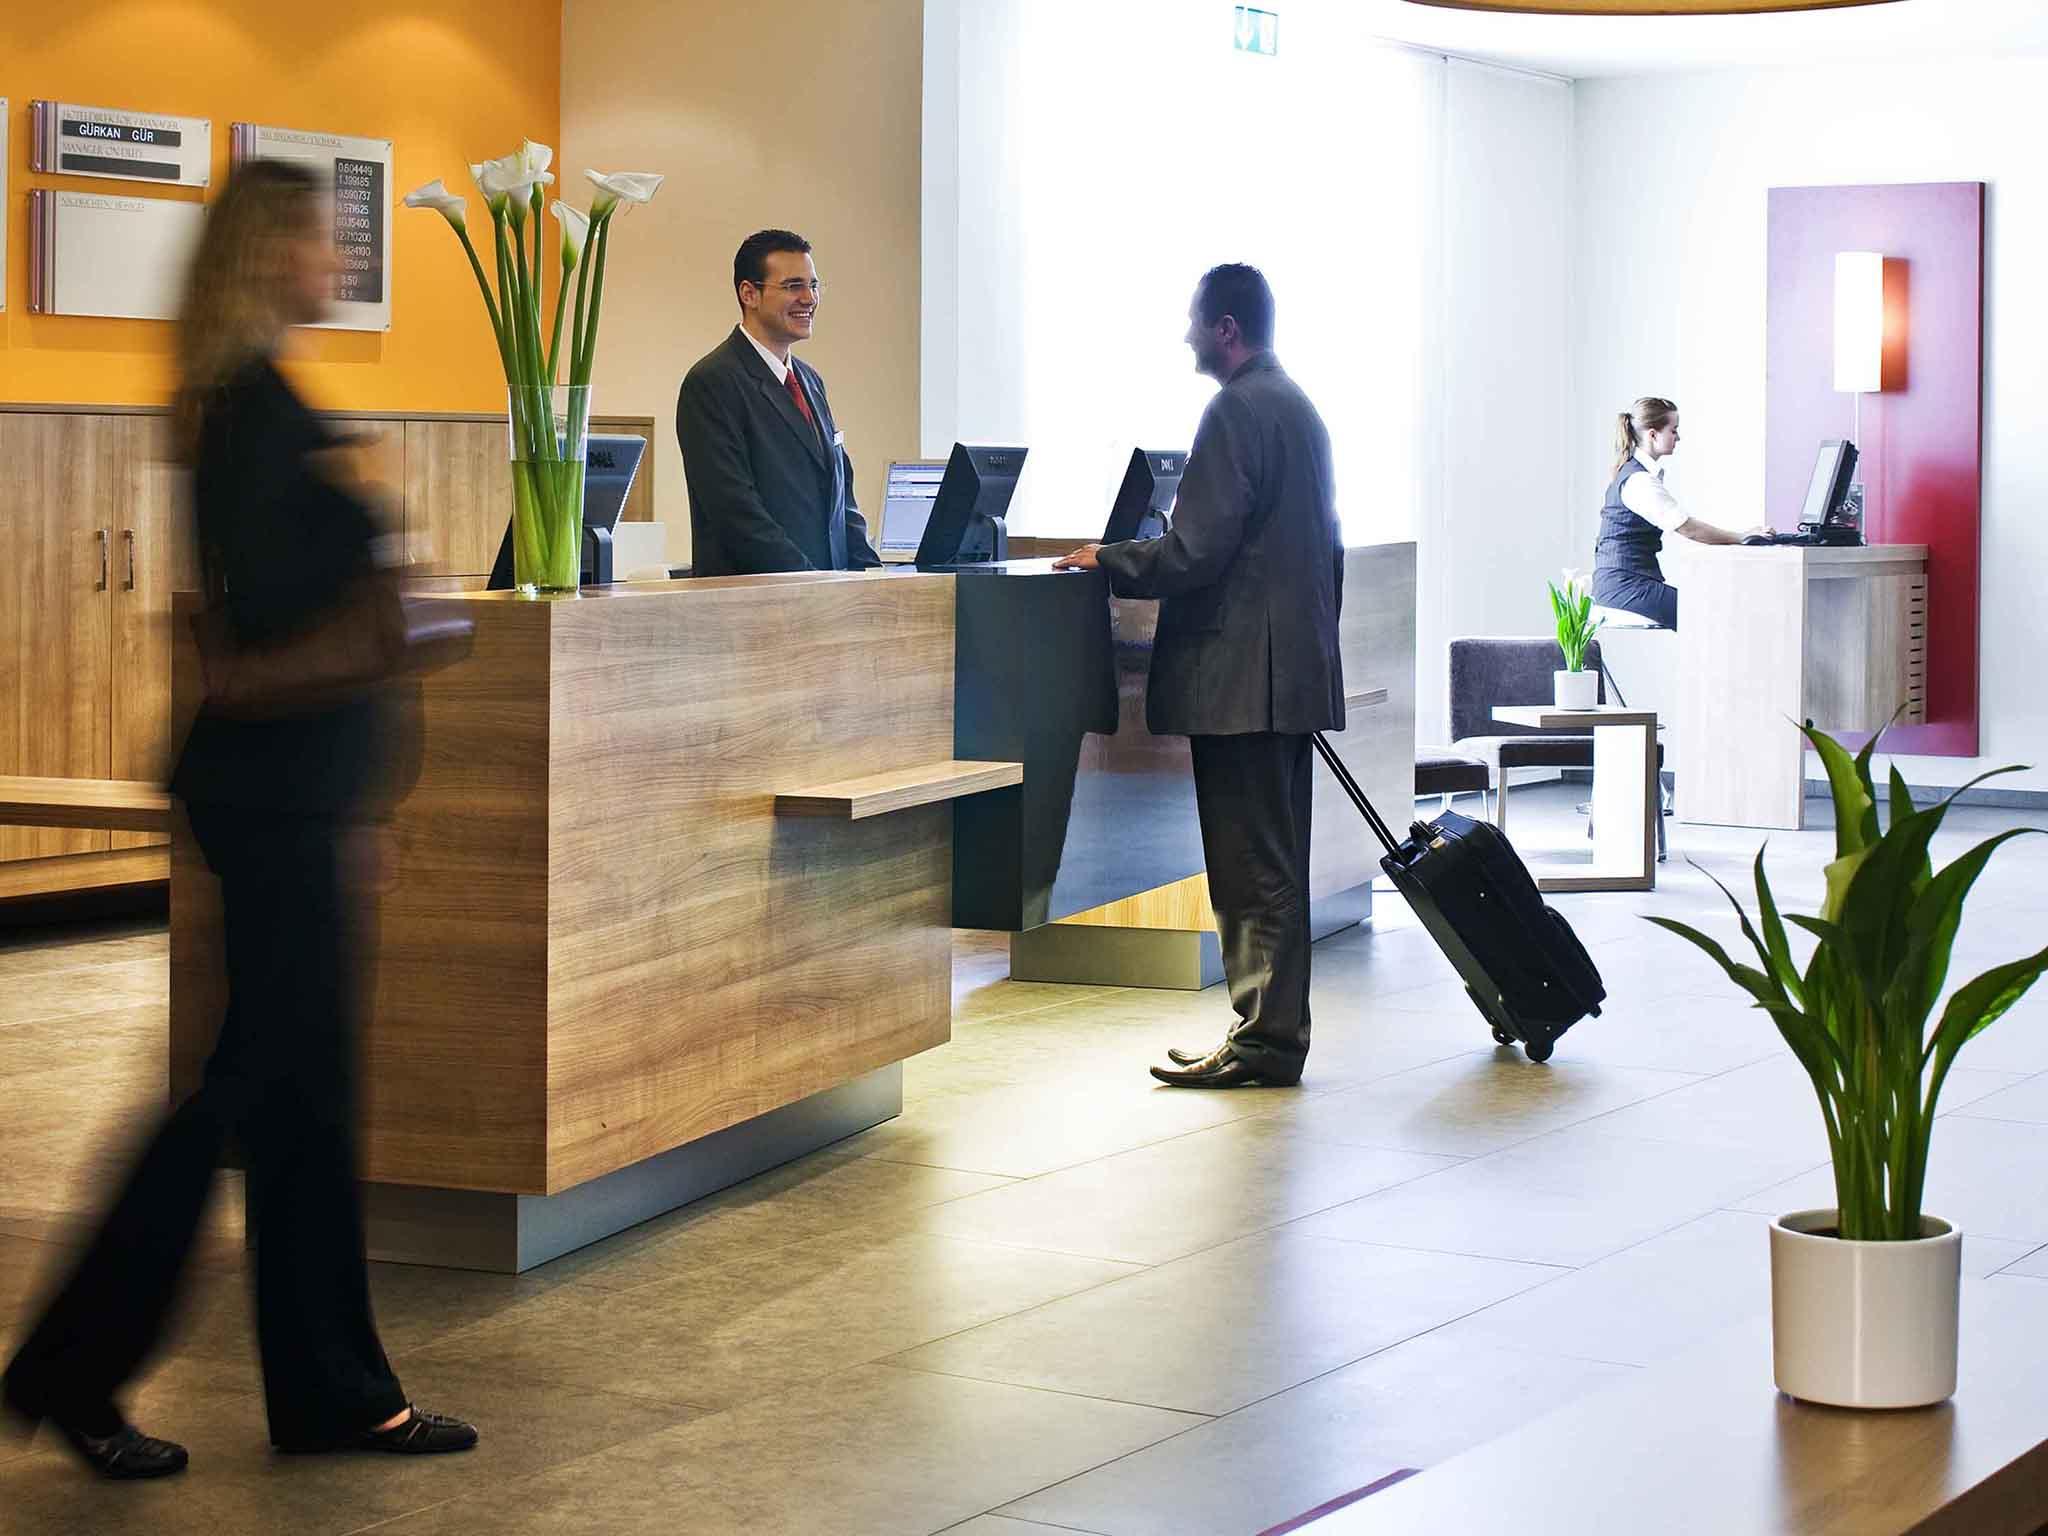 Mercure Hotel Airport Messe Stuttgart